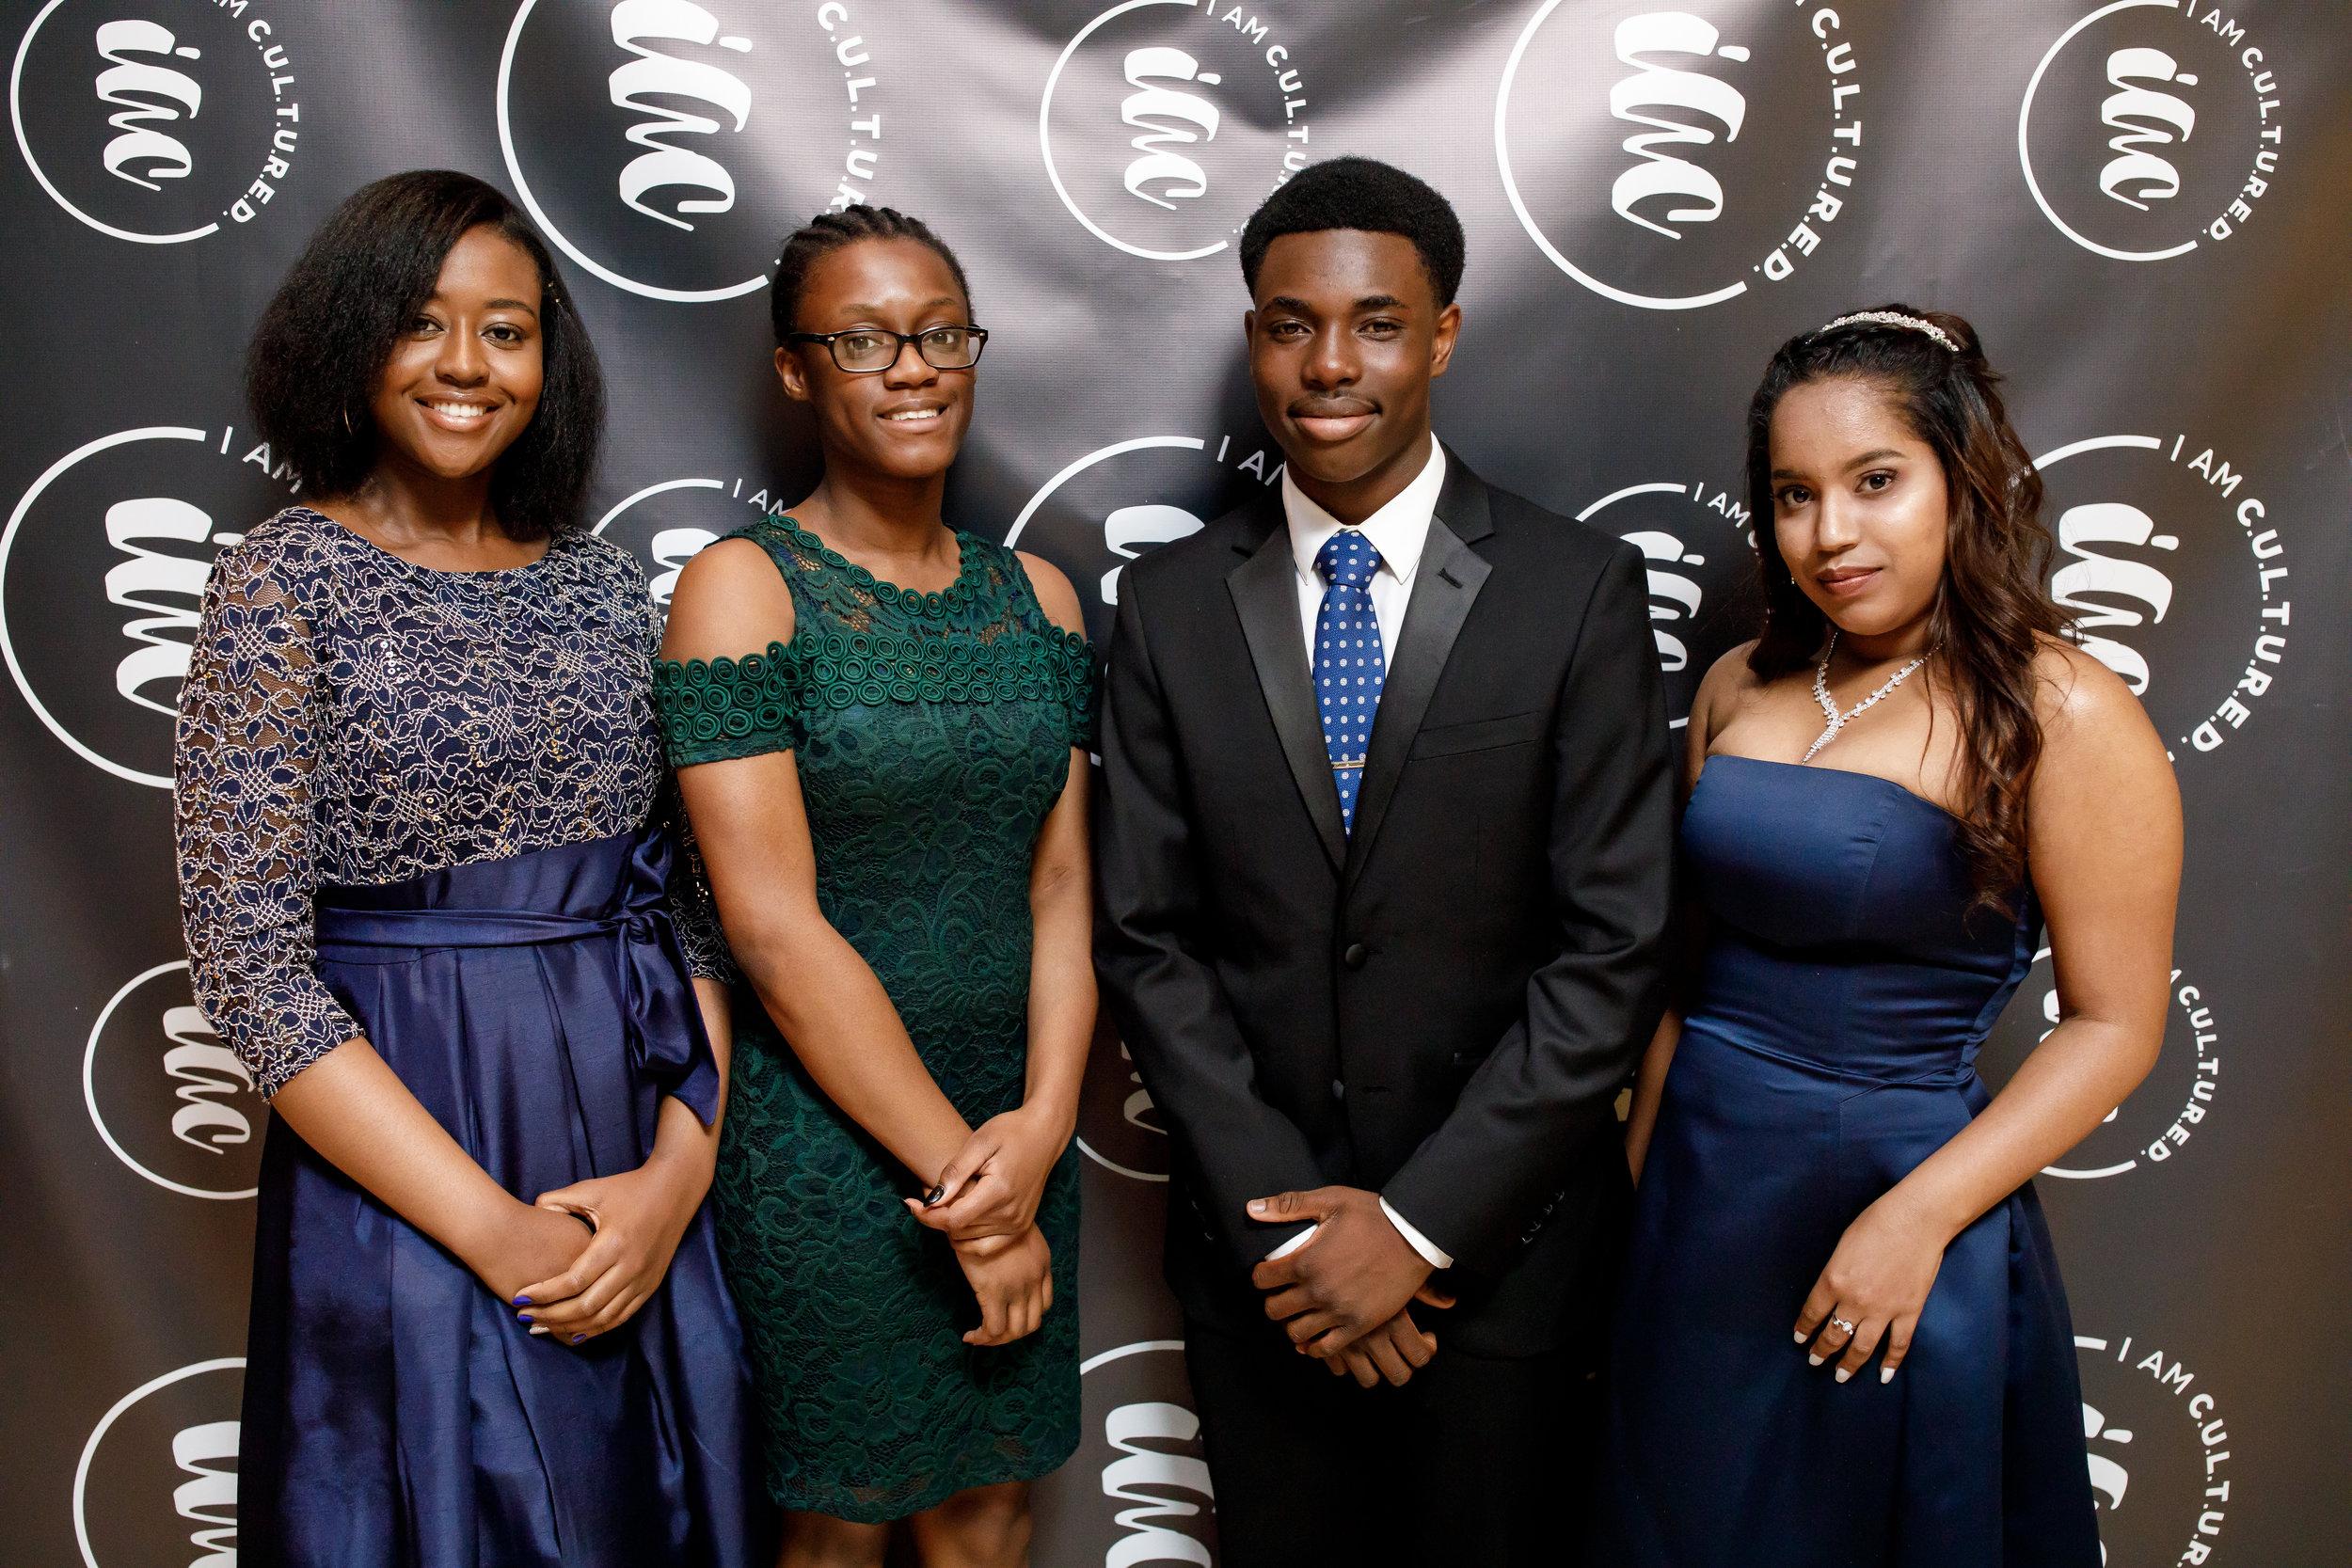 I AM C.U.L.T.U.R.E.D. Cultural Series: Cuba 2017 Alumni